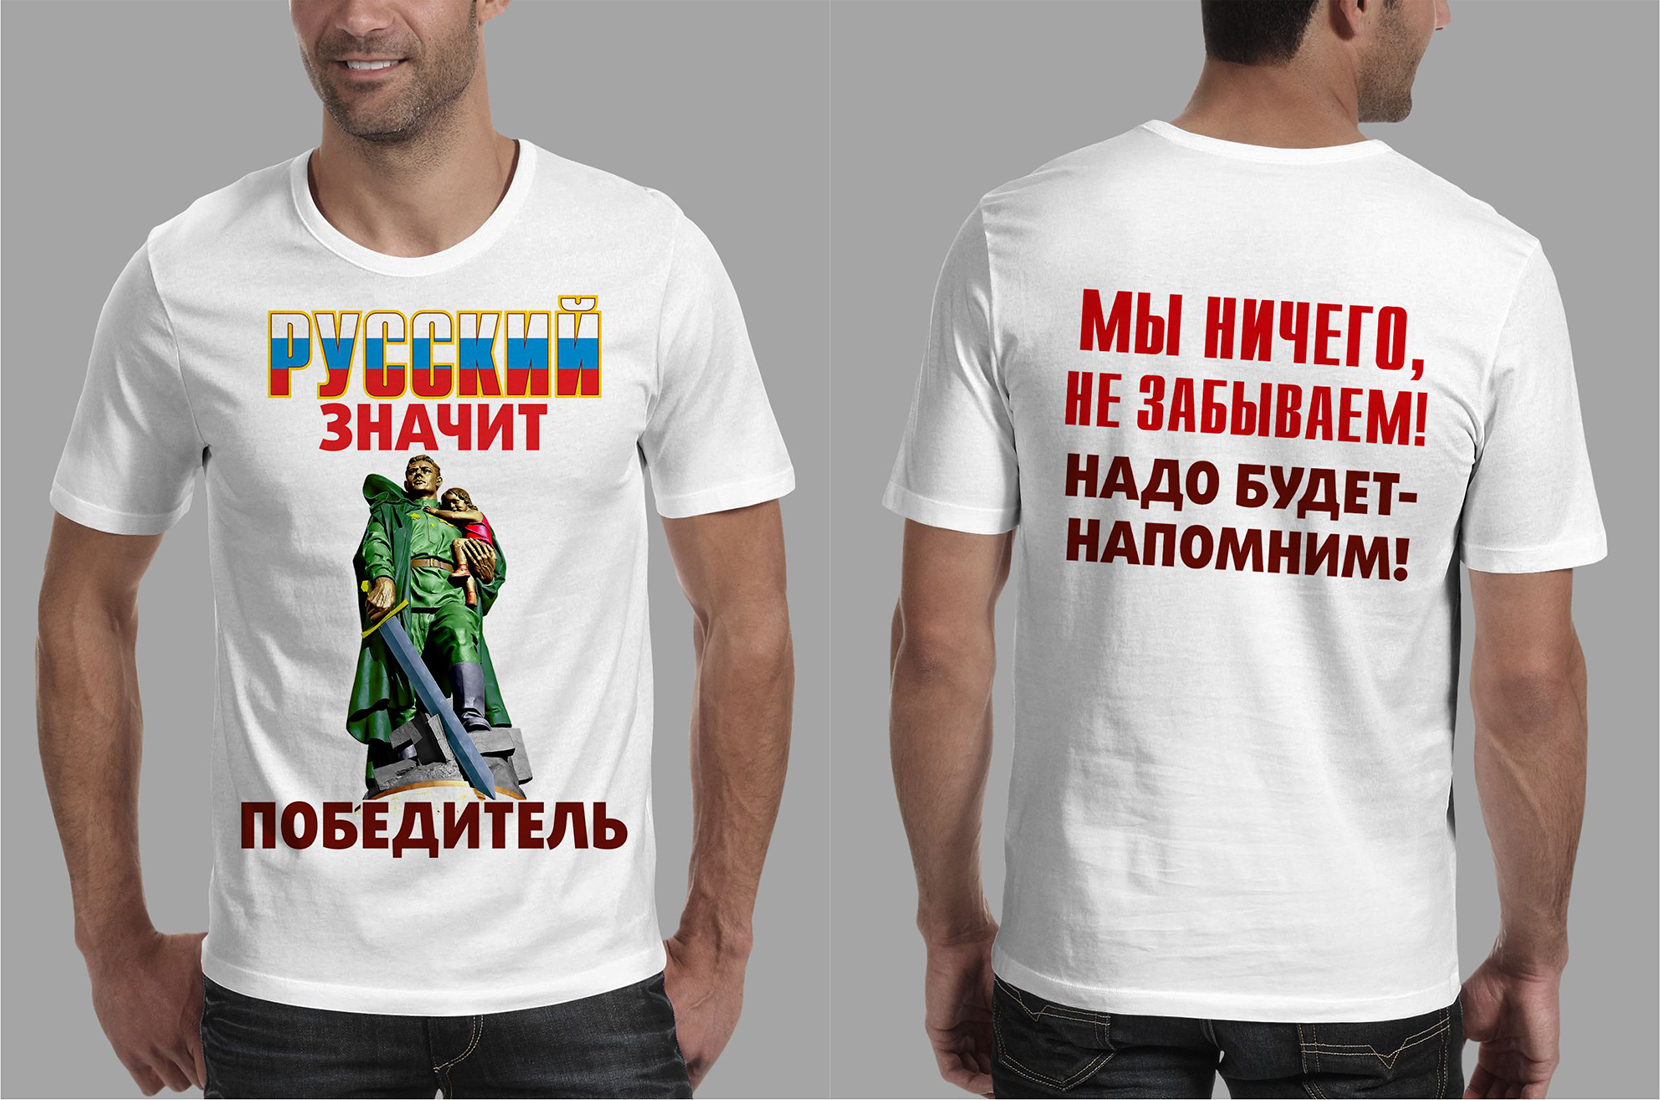 Конкурс принтов на футболки! 1 место 4000р., 2 место 2000р. фото f_33859dd616672267.jpg